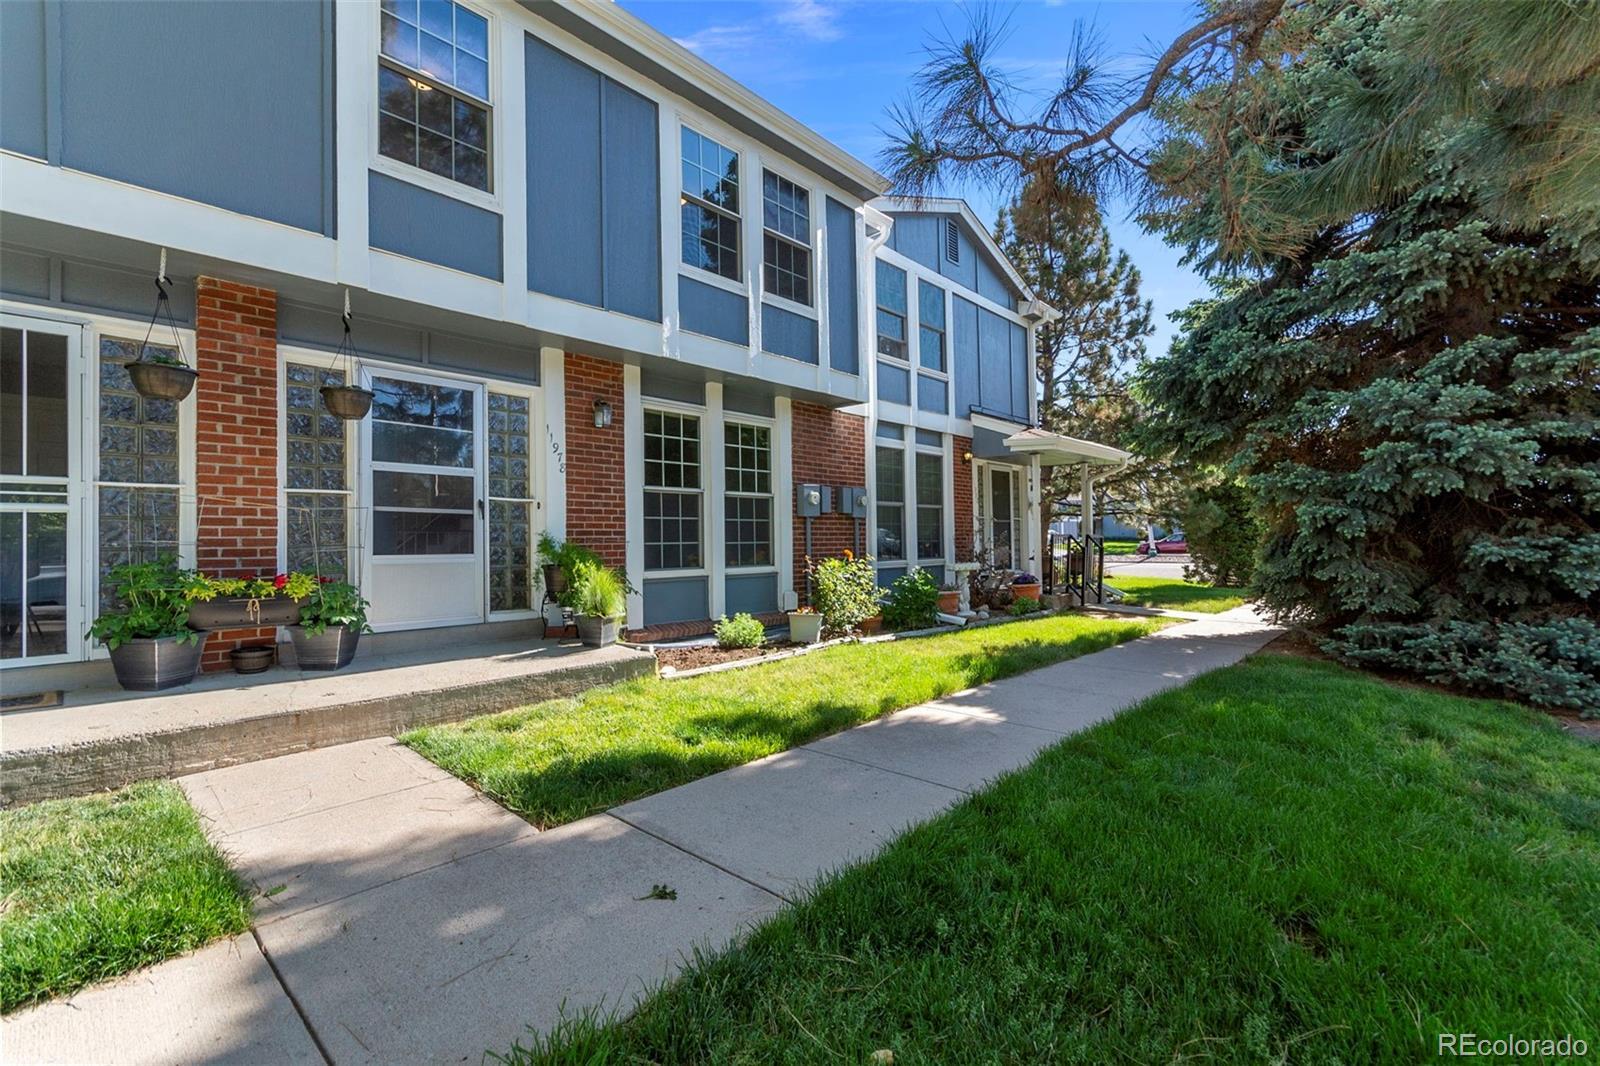 11978 E 1st Place Property Photo - Aurora, CO real estate listing